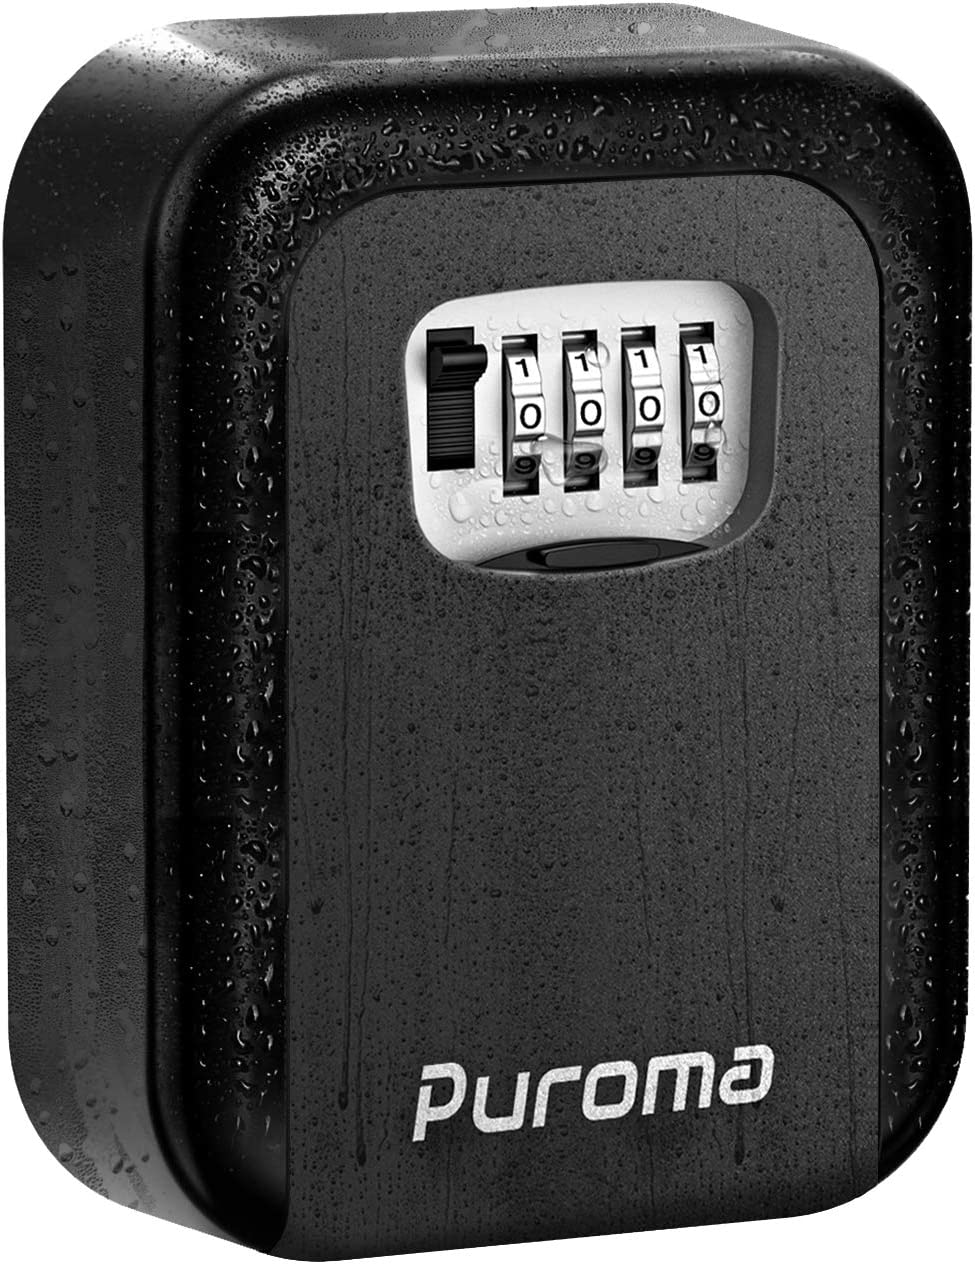 Puroma Security Key Lock Box, 4-Digit Combination Waterproof Portable Key Storage Lockbox Wall Mount 5 Key Large Capacity for House Key, Special Car Key, ID Card (Black)